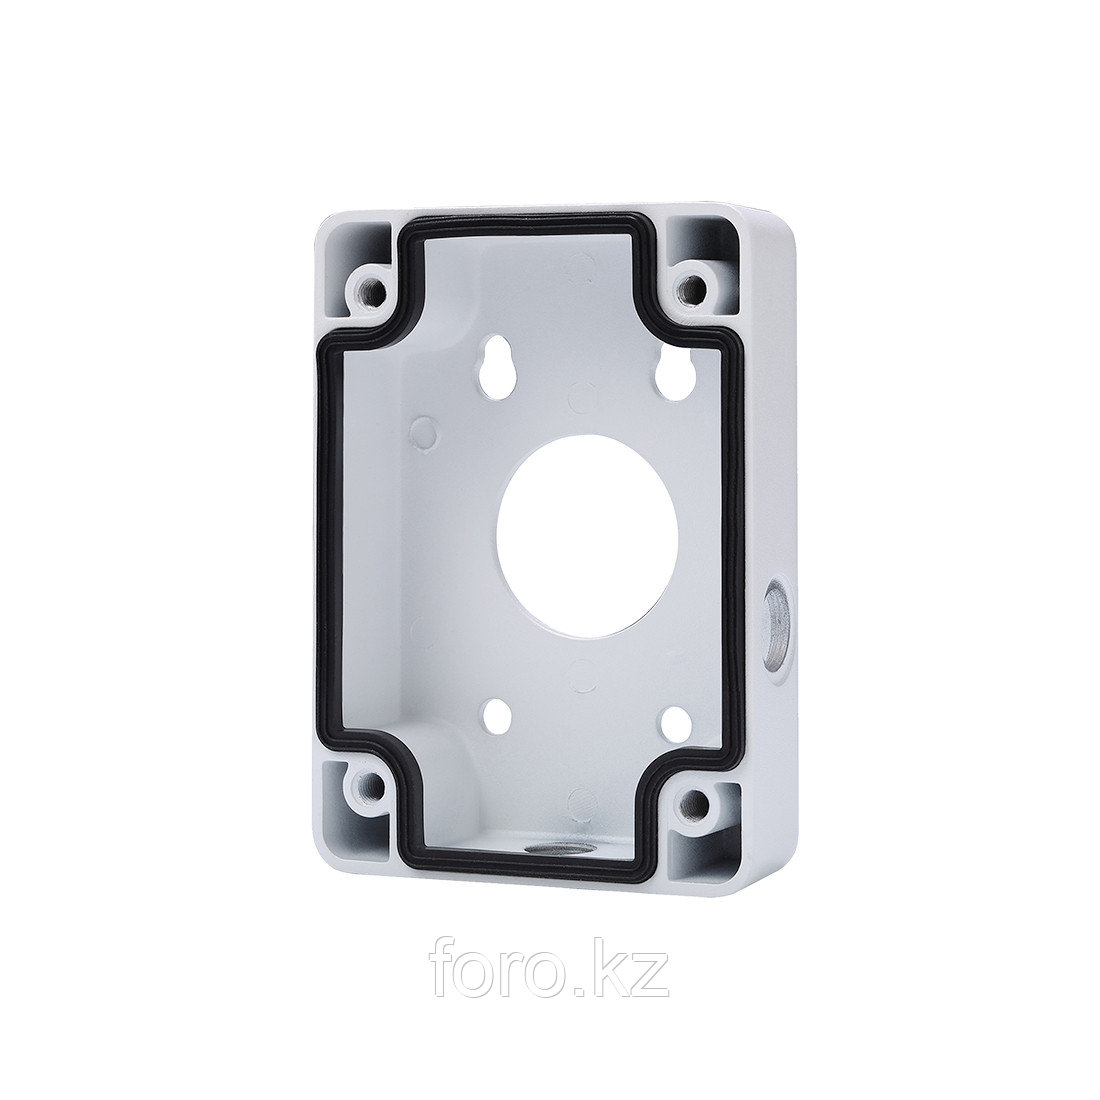 Монтажная коробка для видеокамер (алюминий) Dahua DH-PFA120